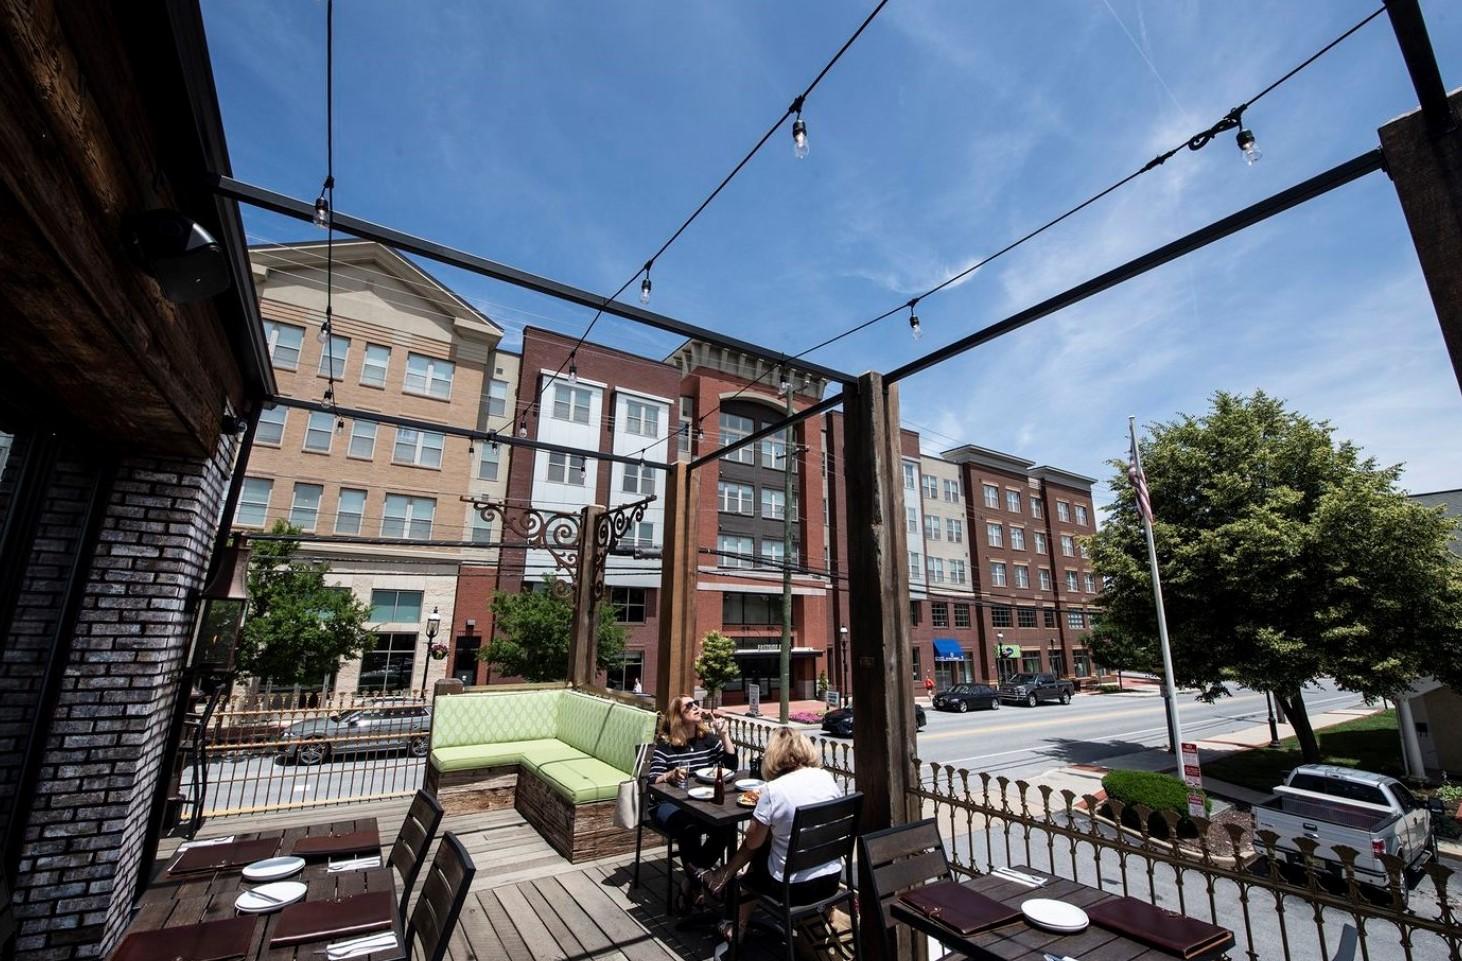 A Look Inside Malvern's Transformation from Sleepy Borough to Restaurant Destination